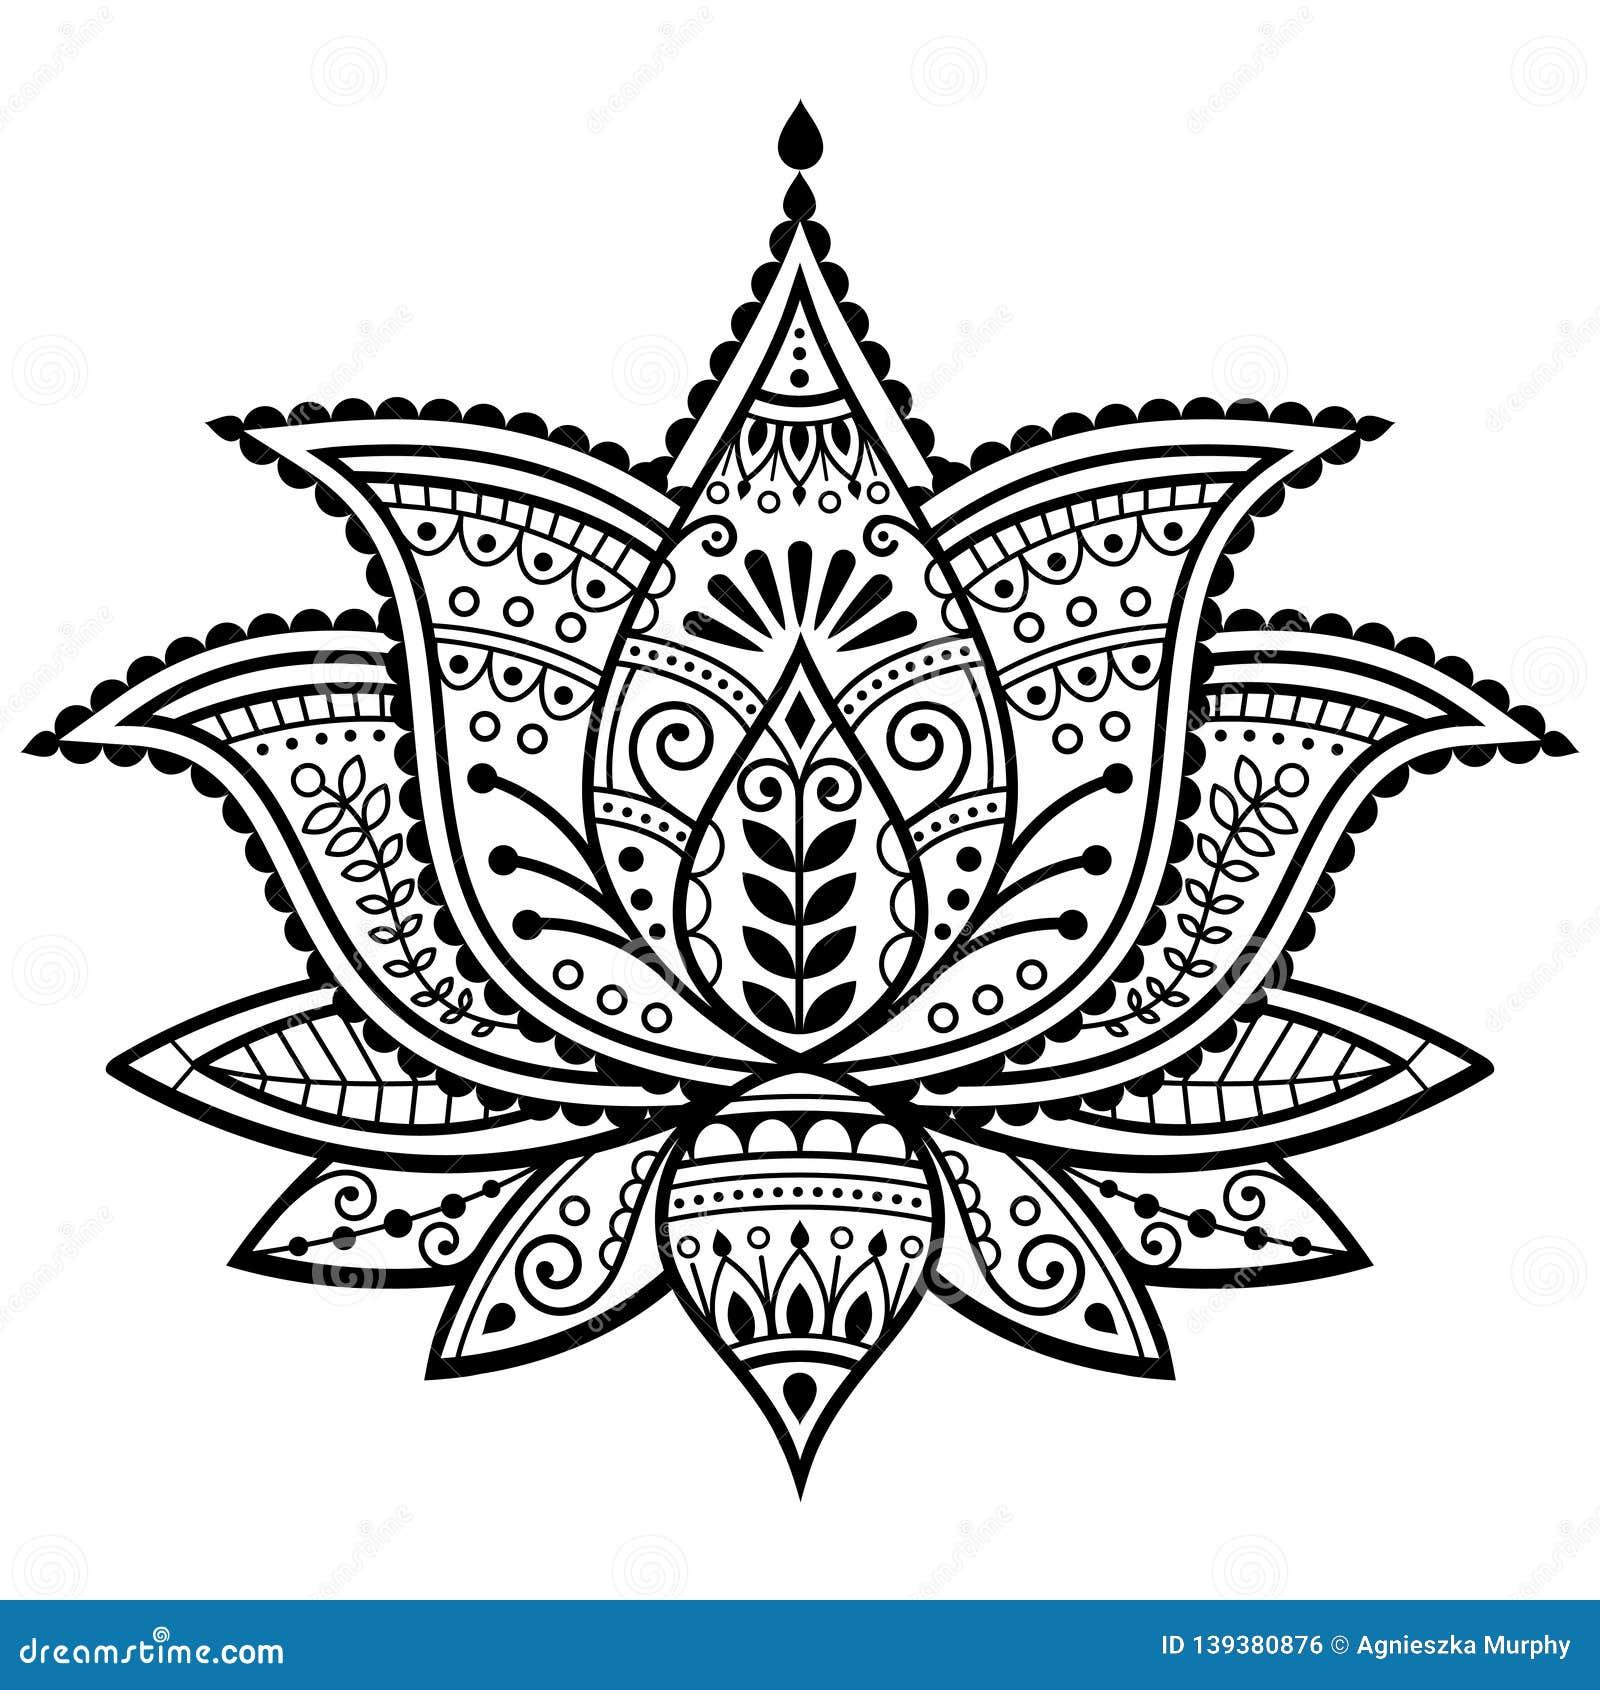 Mehndi Henna Tattoo Lotus Flower Vector Design Indian Ornamental